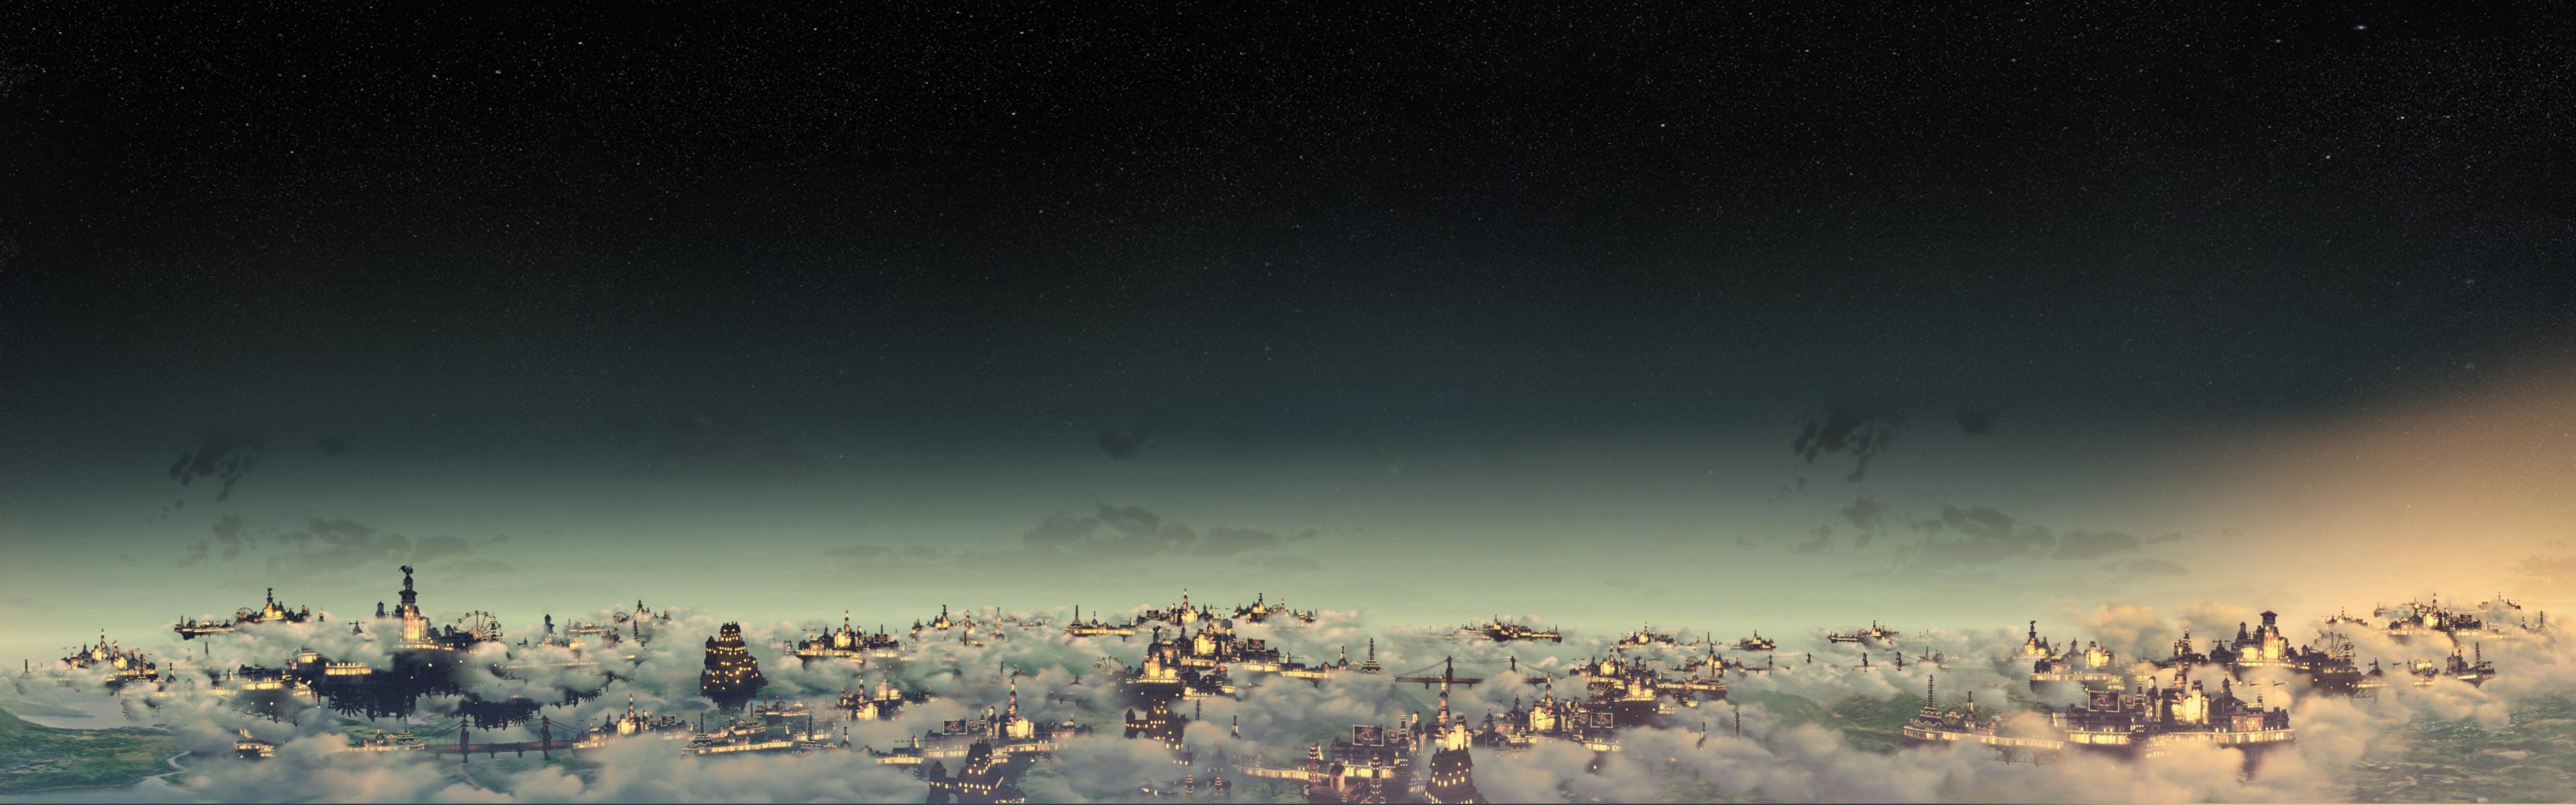 Just beat BioShock Infinite. I had to make this Columbia Panorama Wallpaper  (Dual Monitor)